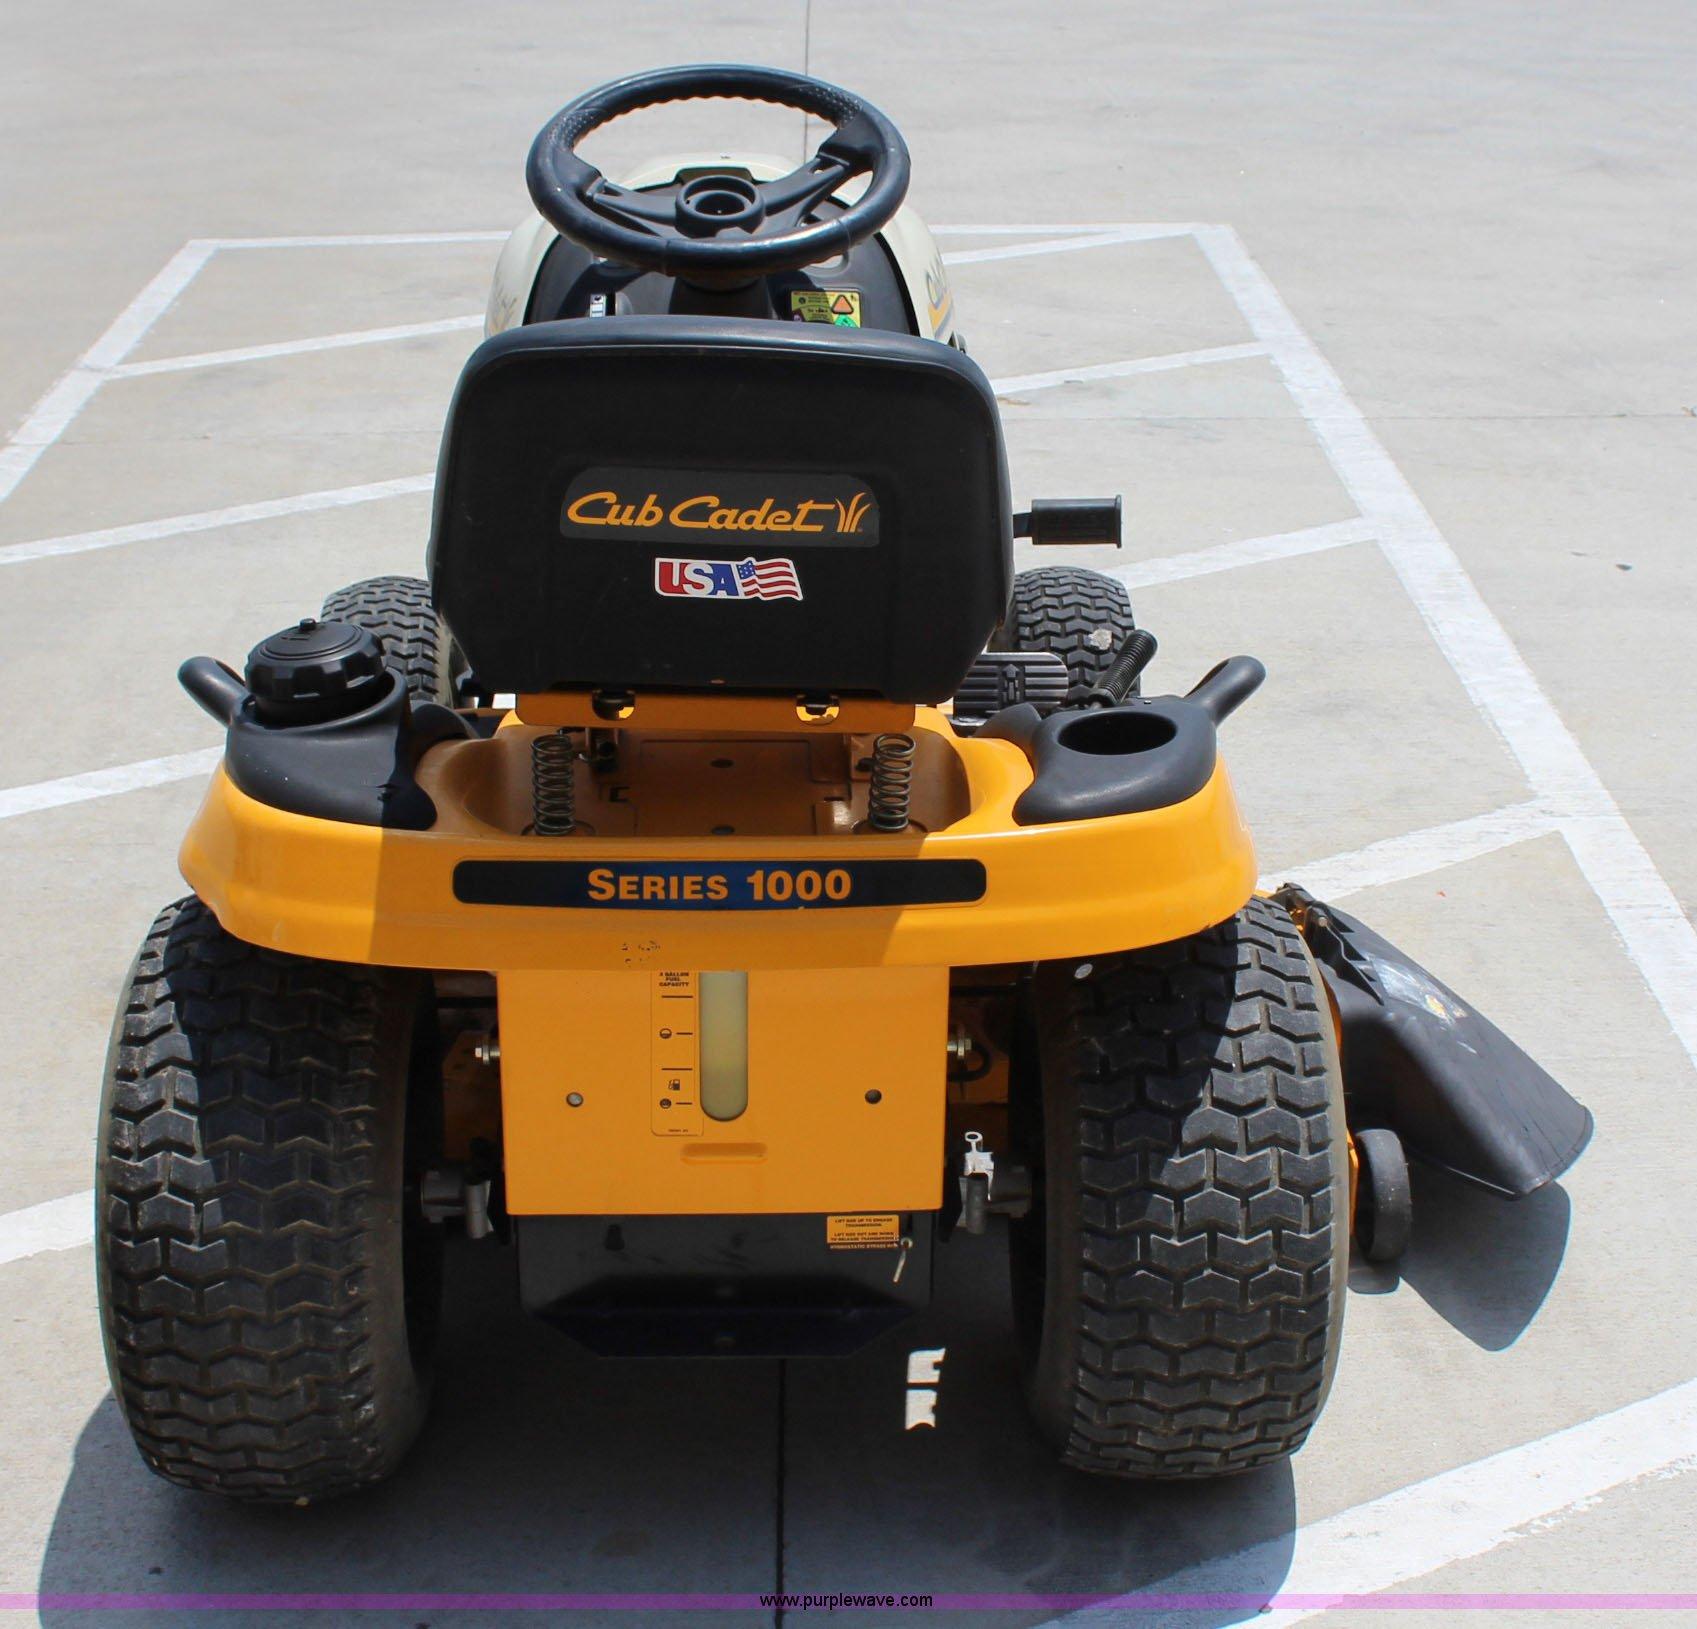 2005 Cub Cadet LT1046 lawn mower | Item I1656 | SOLD! July 1